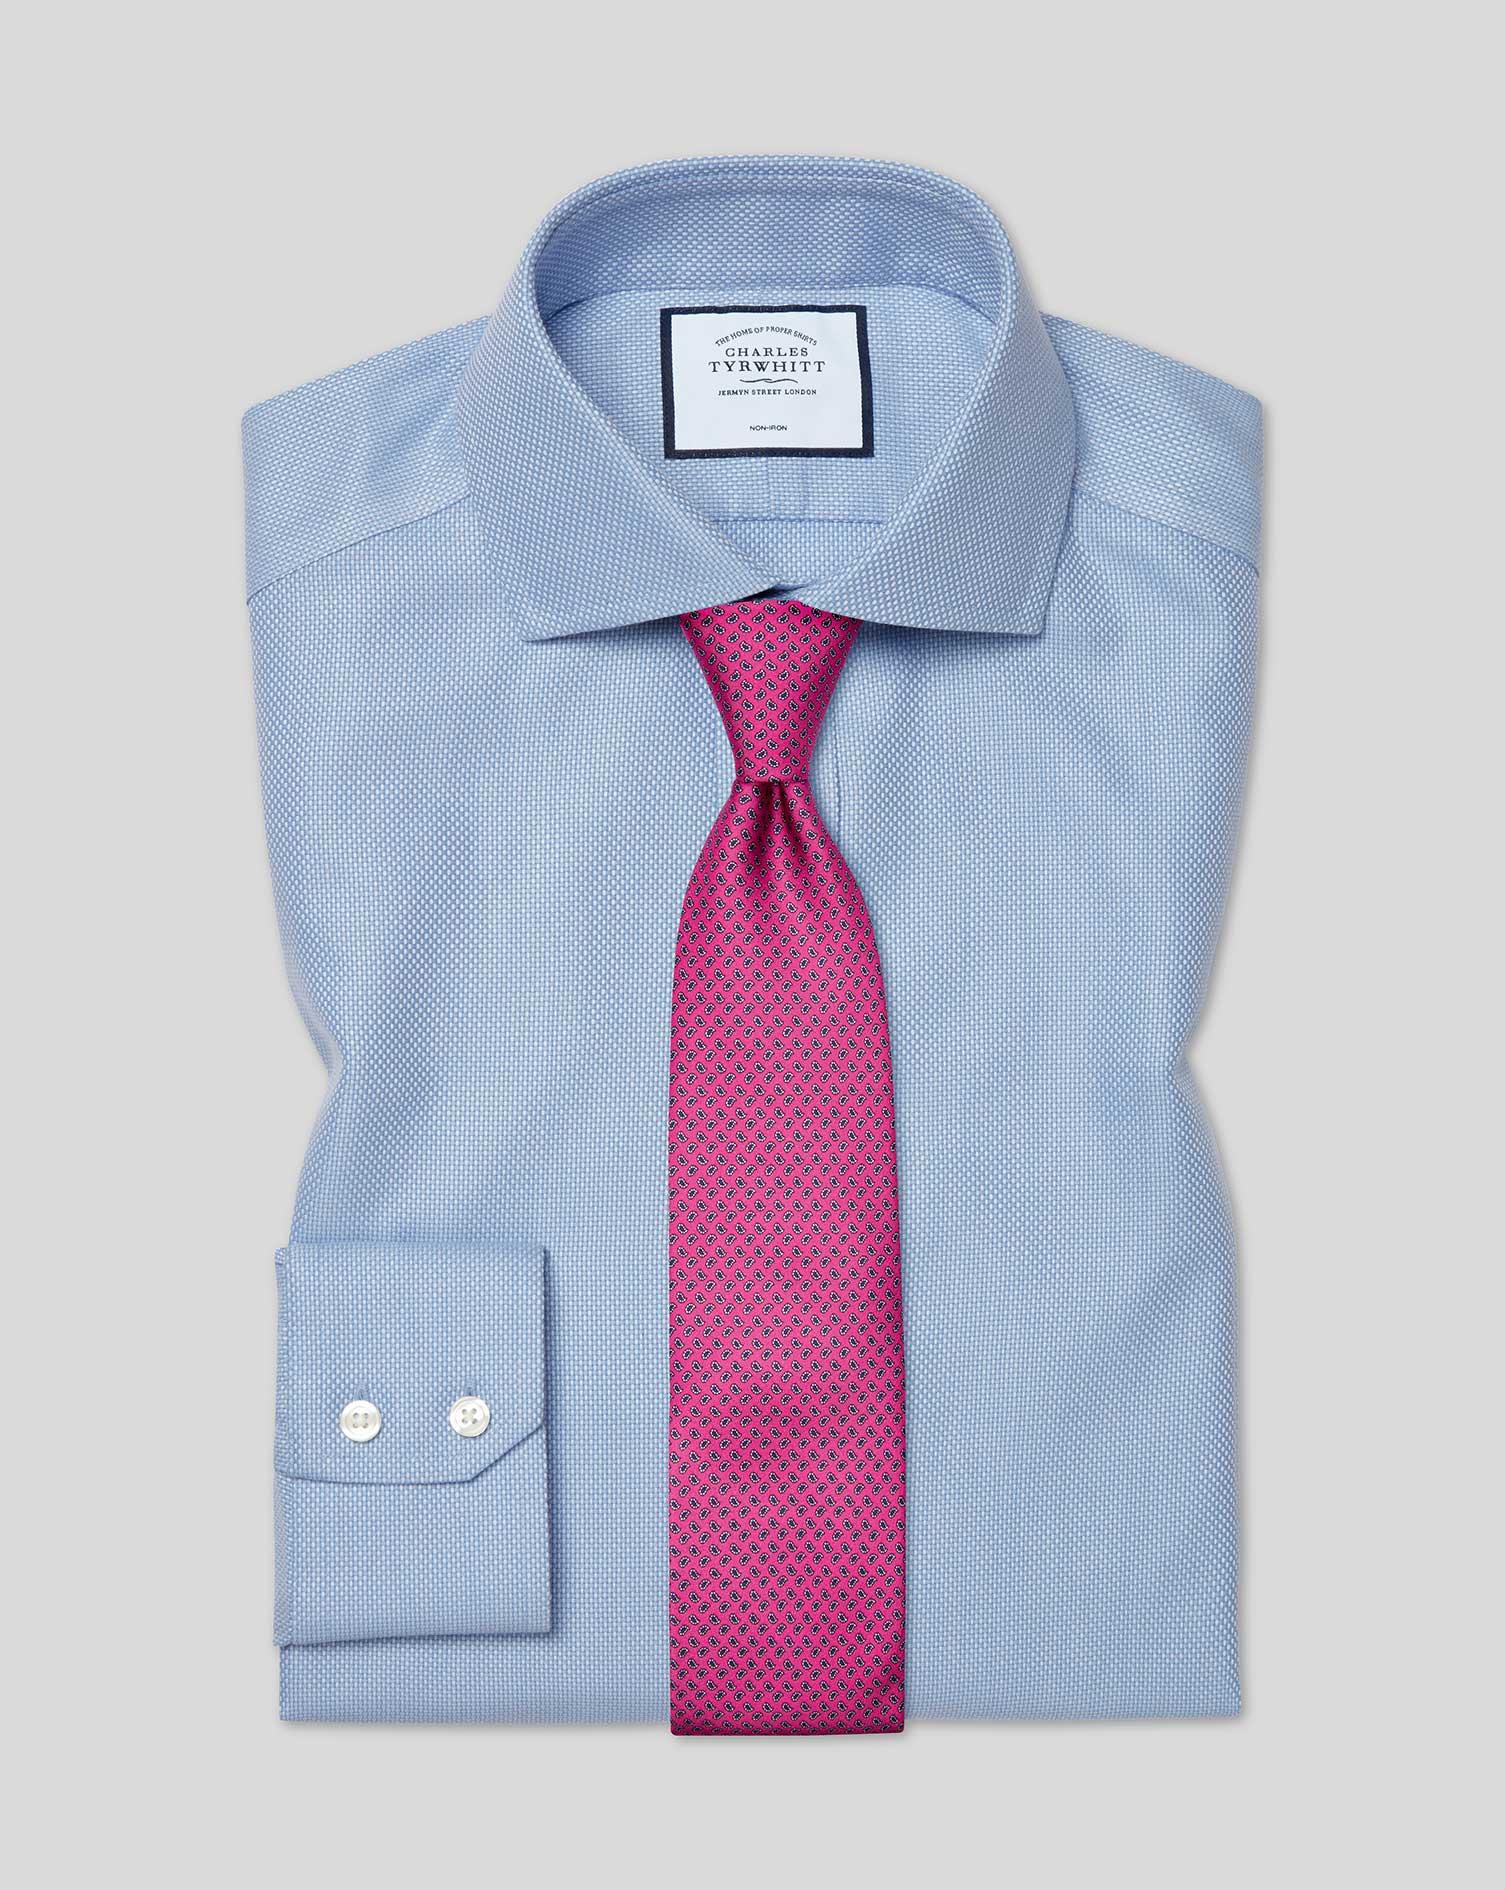 Cotton Slim Fit Cutaway Non-Iron Buckingham Weave Blue Shirt